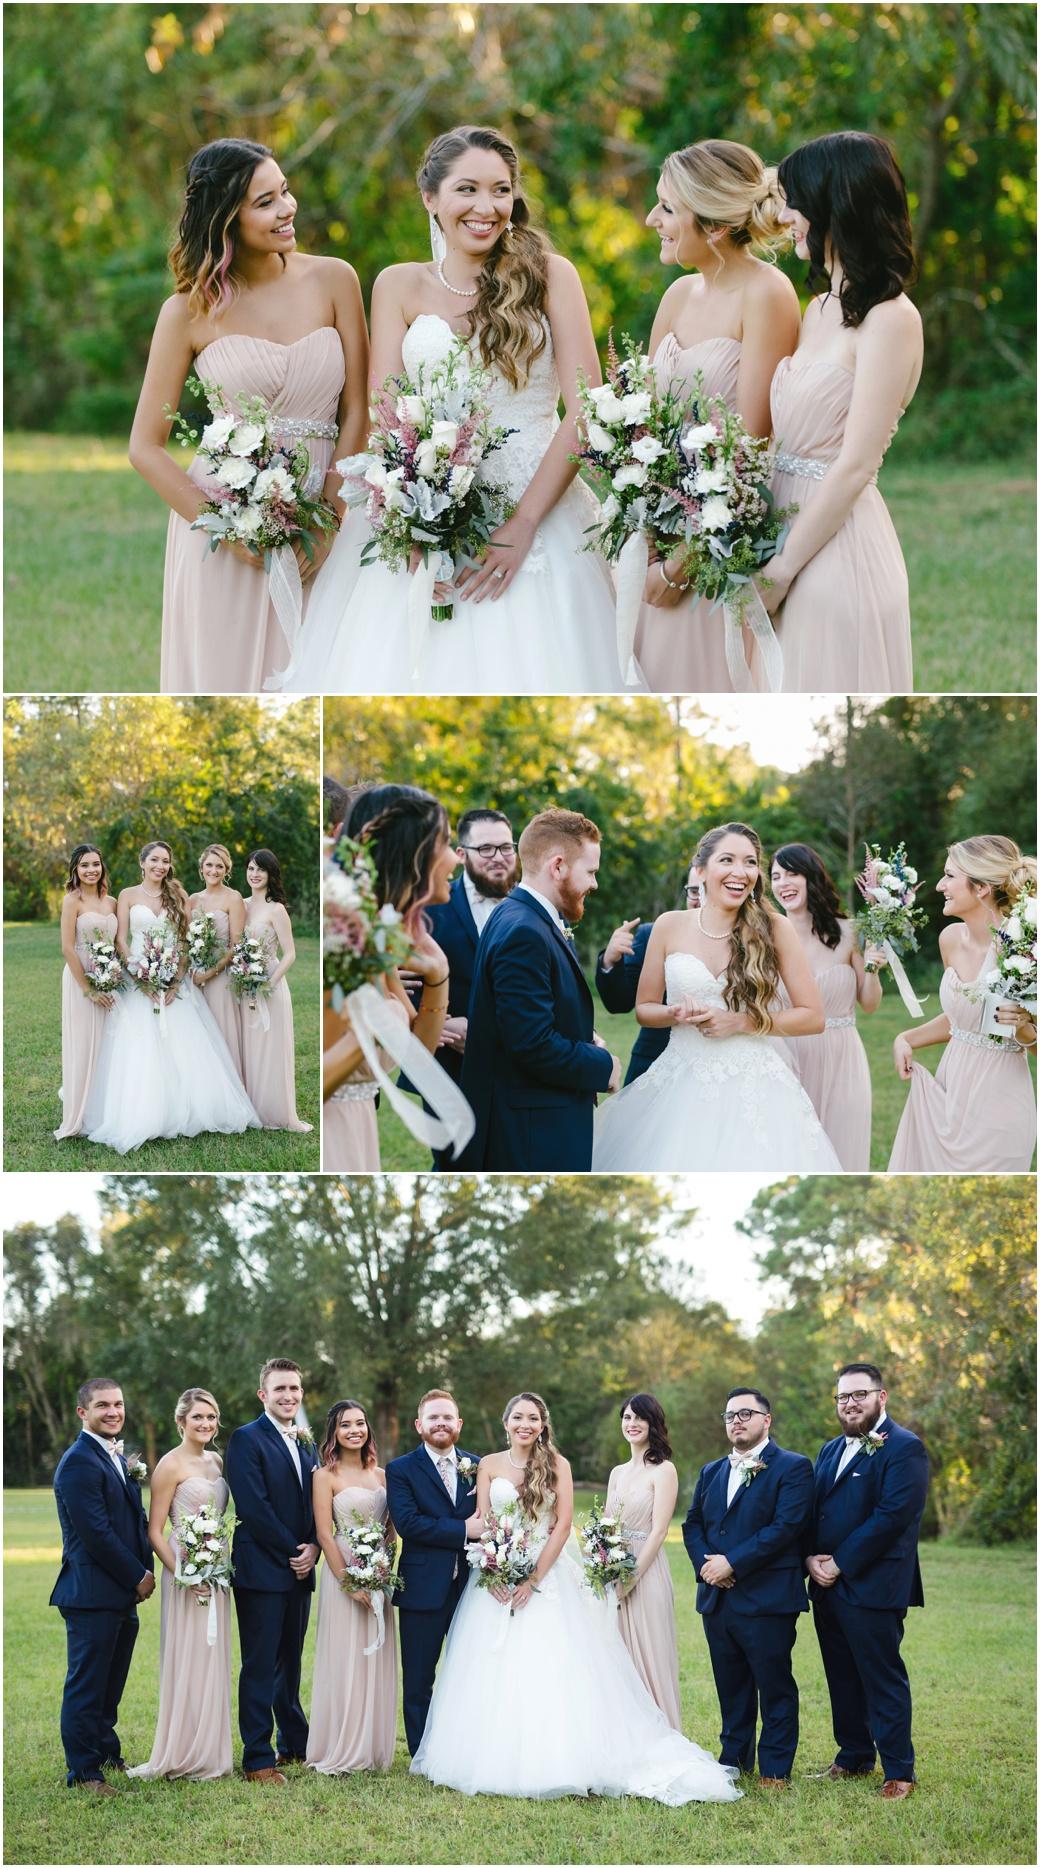 Dalziel-ft-myers-wedding-0014